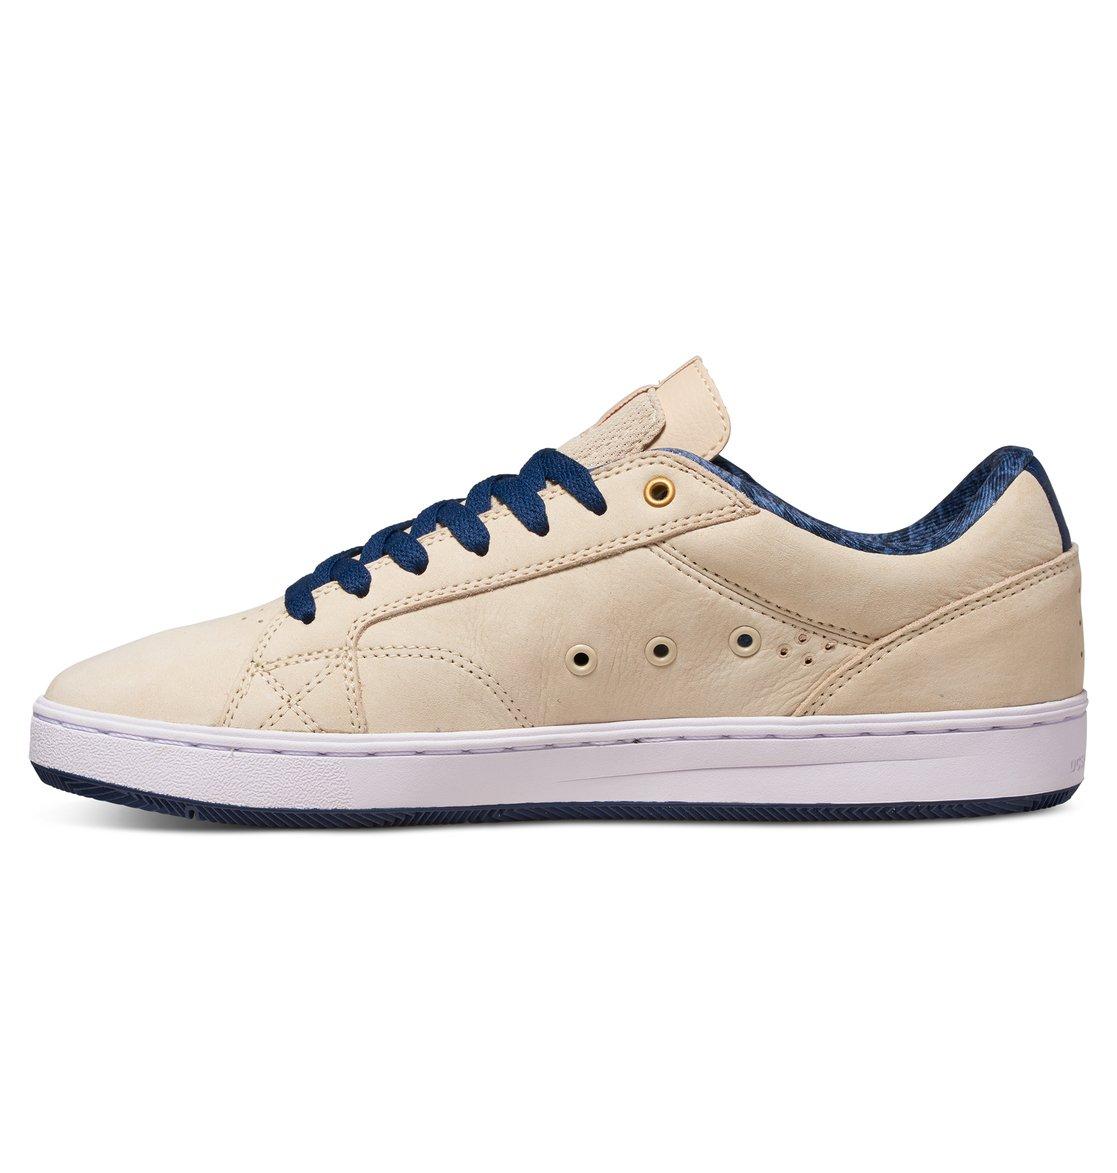 Kolnoo  Chaussures Converse All Star blanches Casual femme DC Shoes Lynnfield S - Skate Shoes - Chaussures de Skate - Homme  Noir (Cblack) YXT9X51jyO